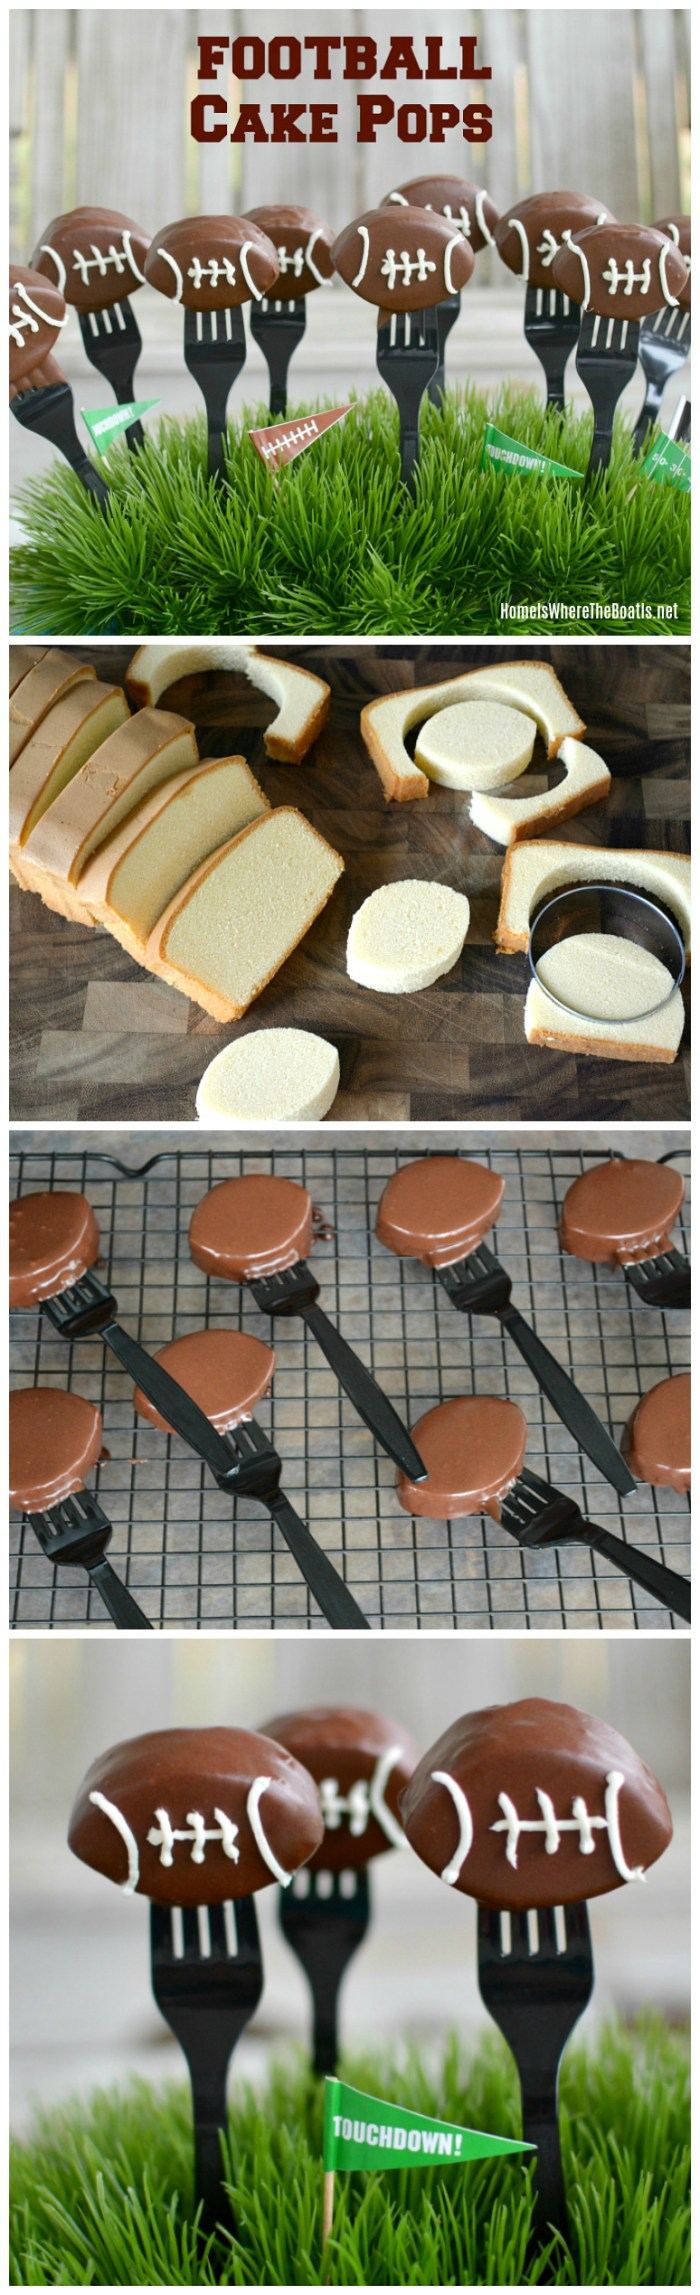 Football Cake Pops! A sweet ending to your game day line of football food! | ©homeiswheretheboatis.net #footballfood #dessert #cakepop #gameday #superbowl